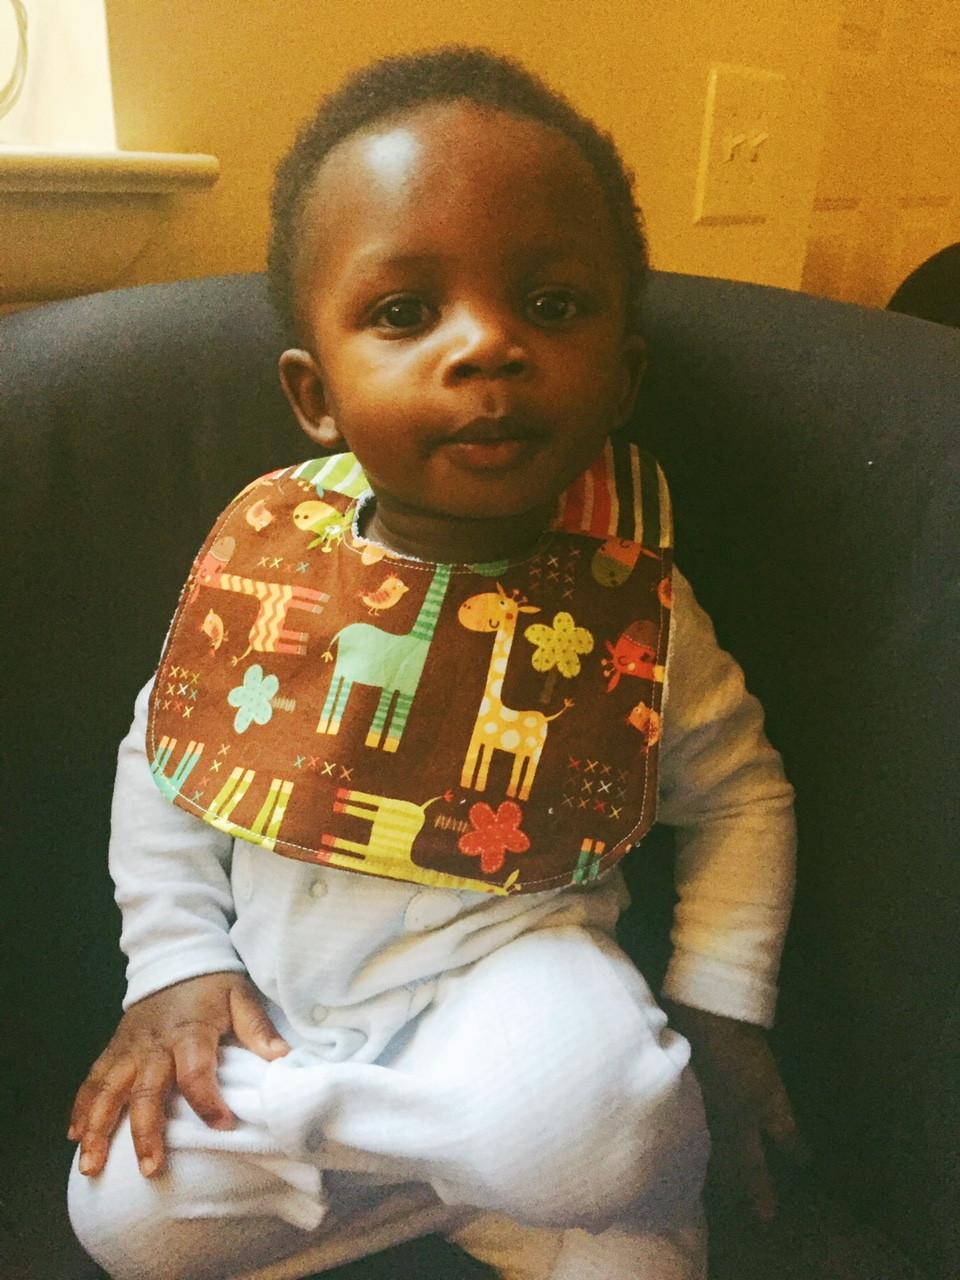 Handmade Baby Bibs and Burp Cloths - Giraffe Print